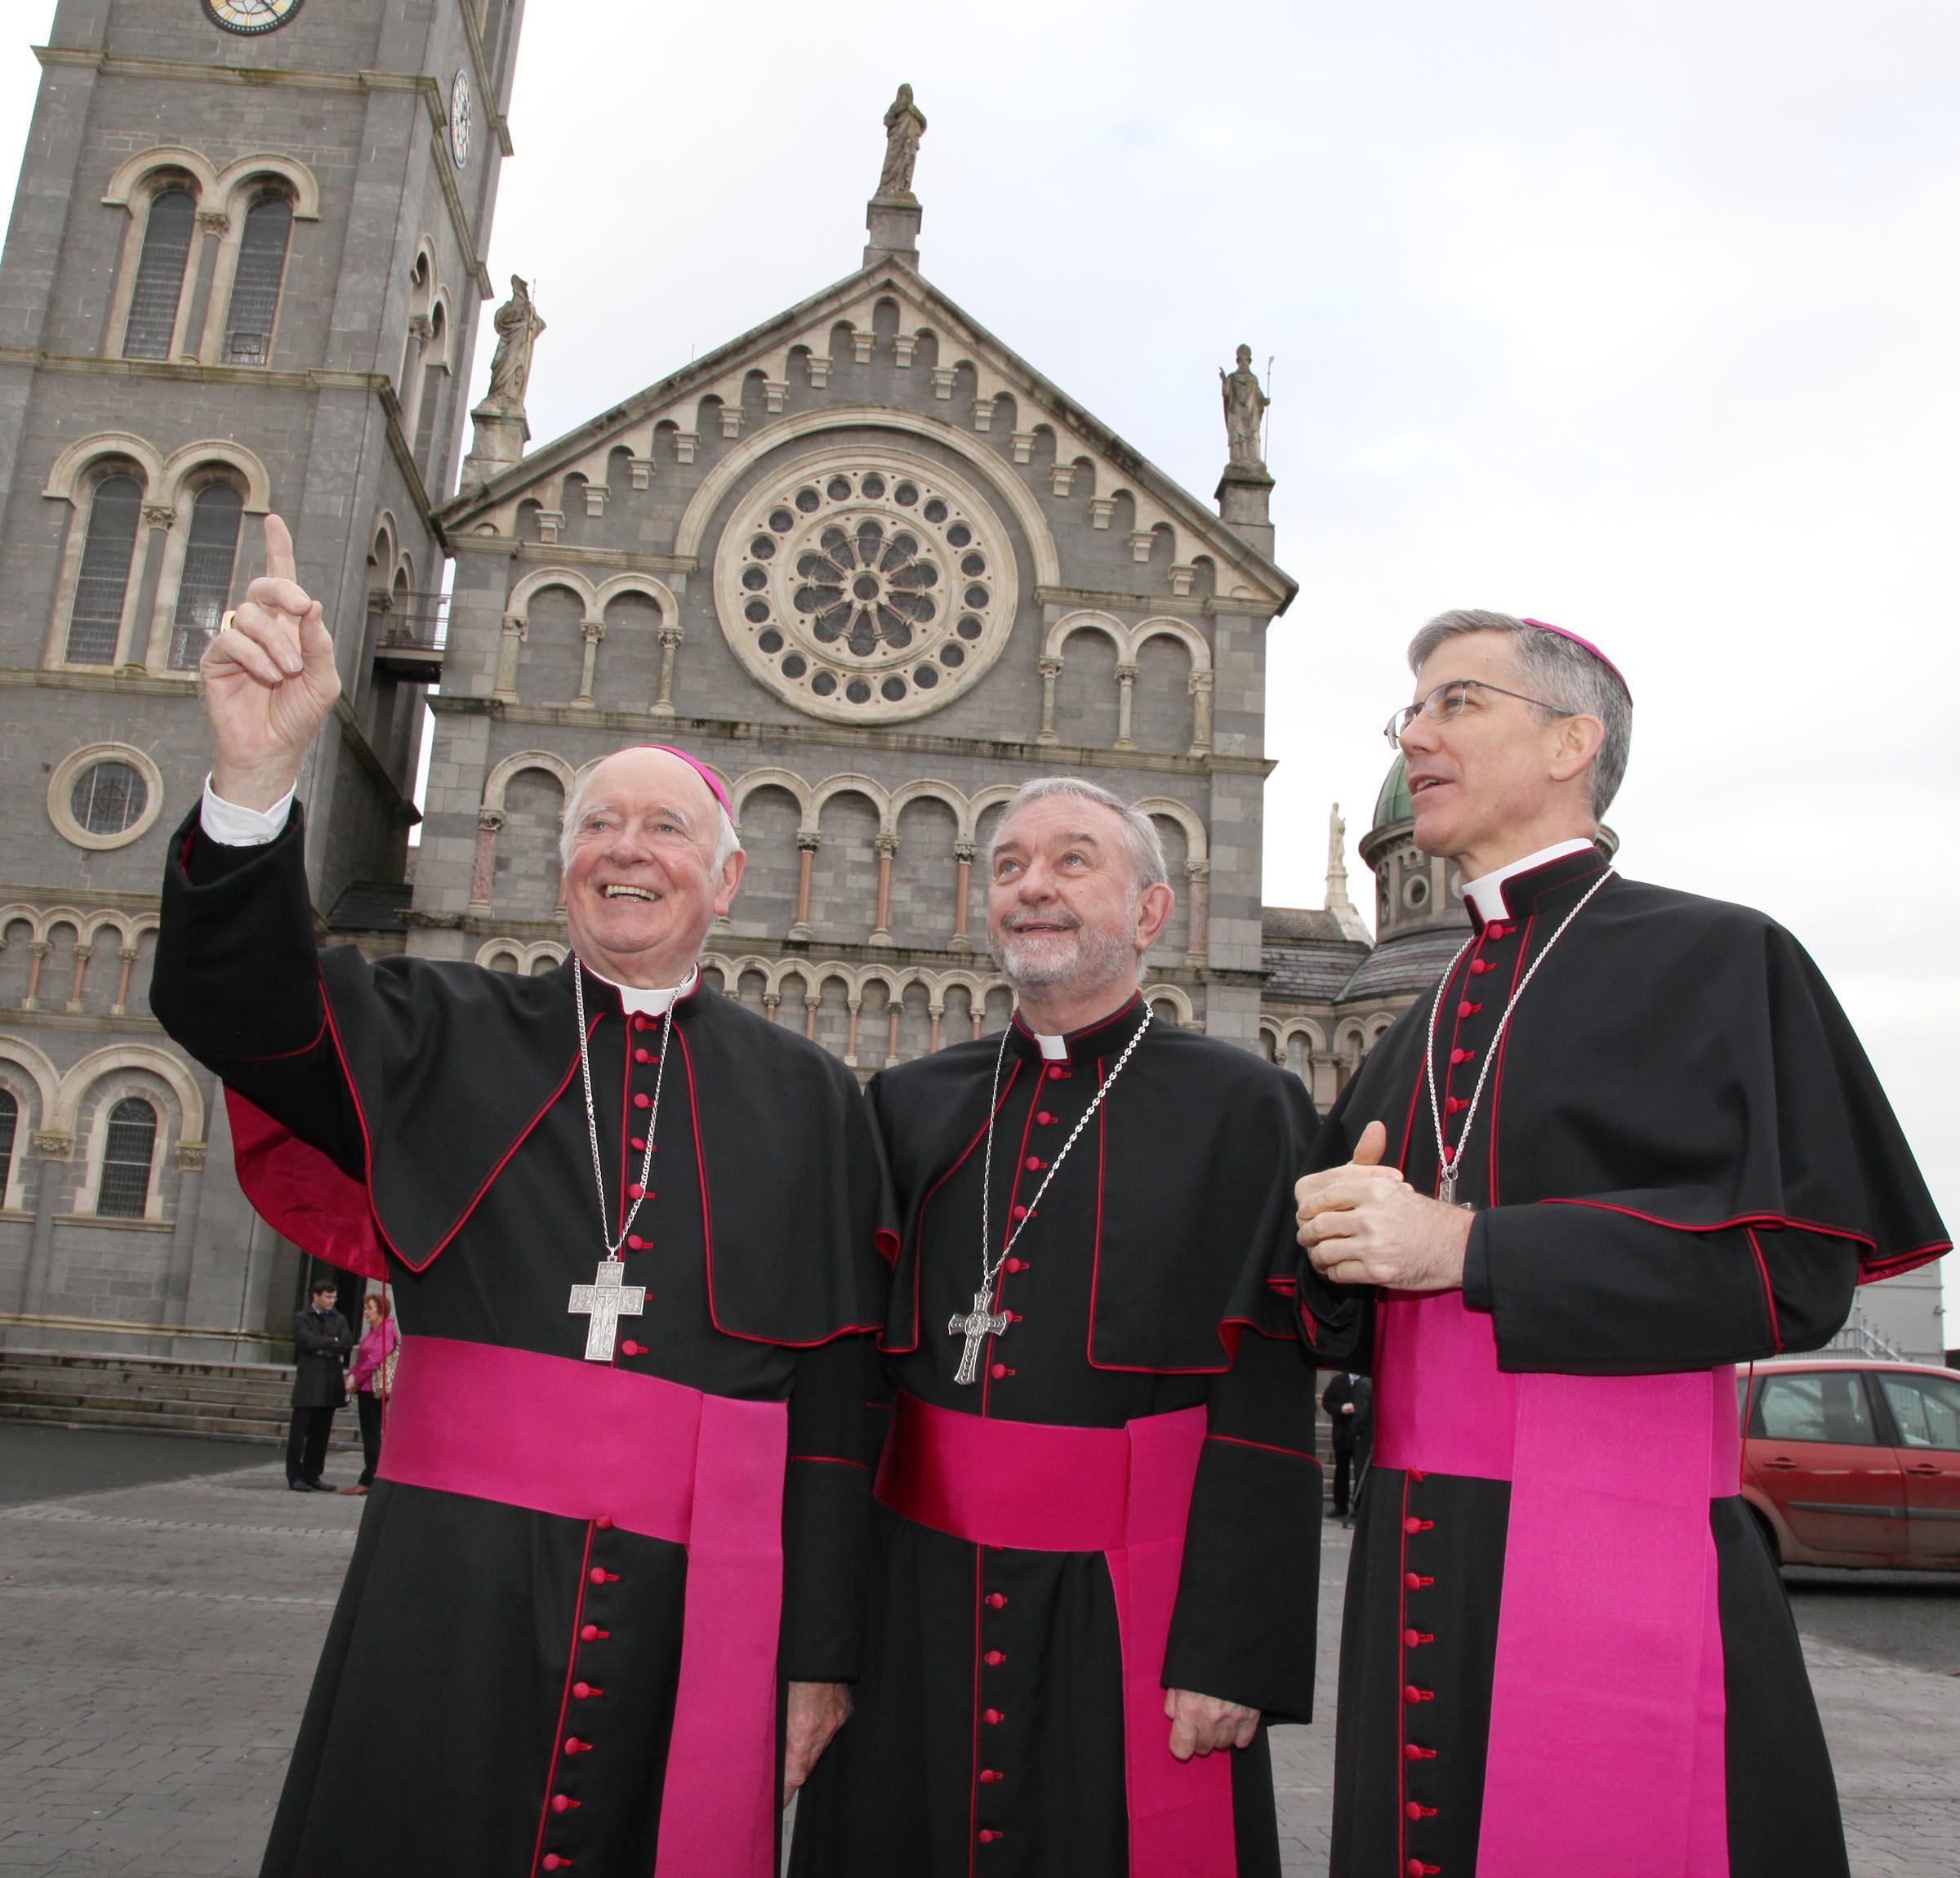 Bishop kieran oreilly to lead cashel emly catholicireland archbishop dermot clifford with the new archbishop of cashel and emly bishop kieran oreilly m4hsunfo